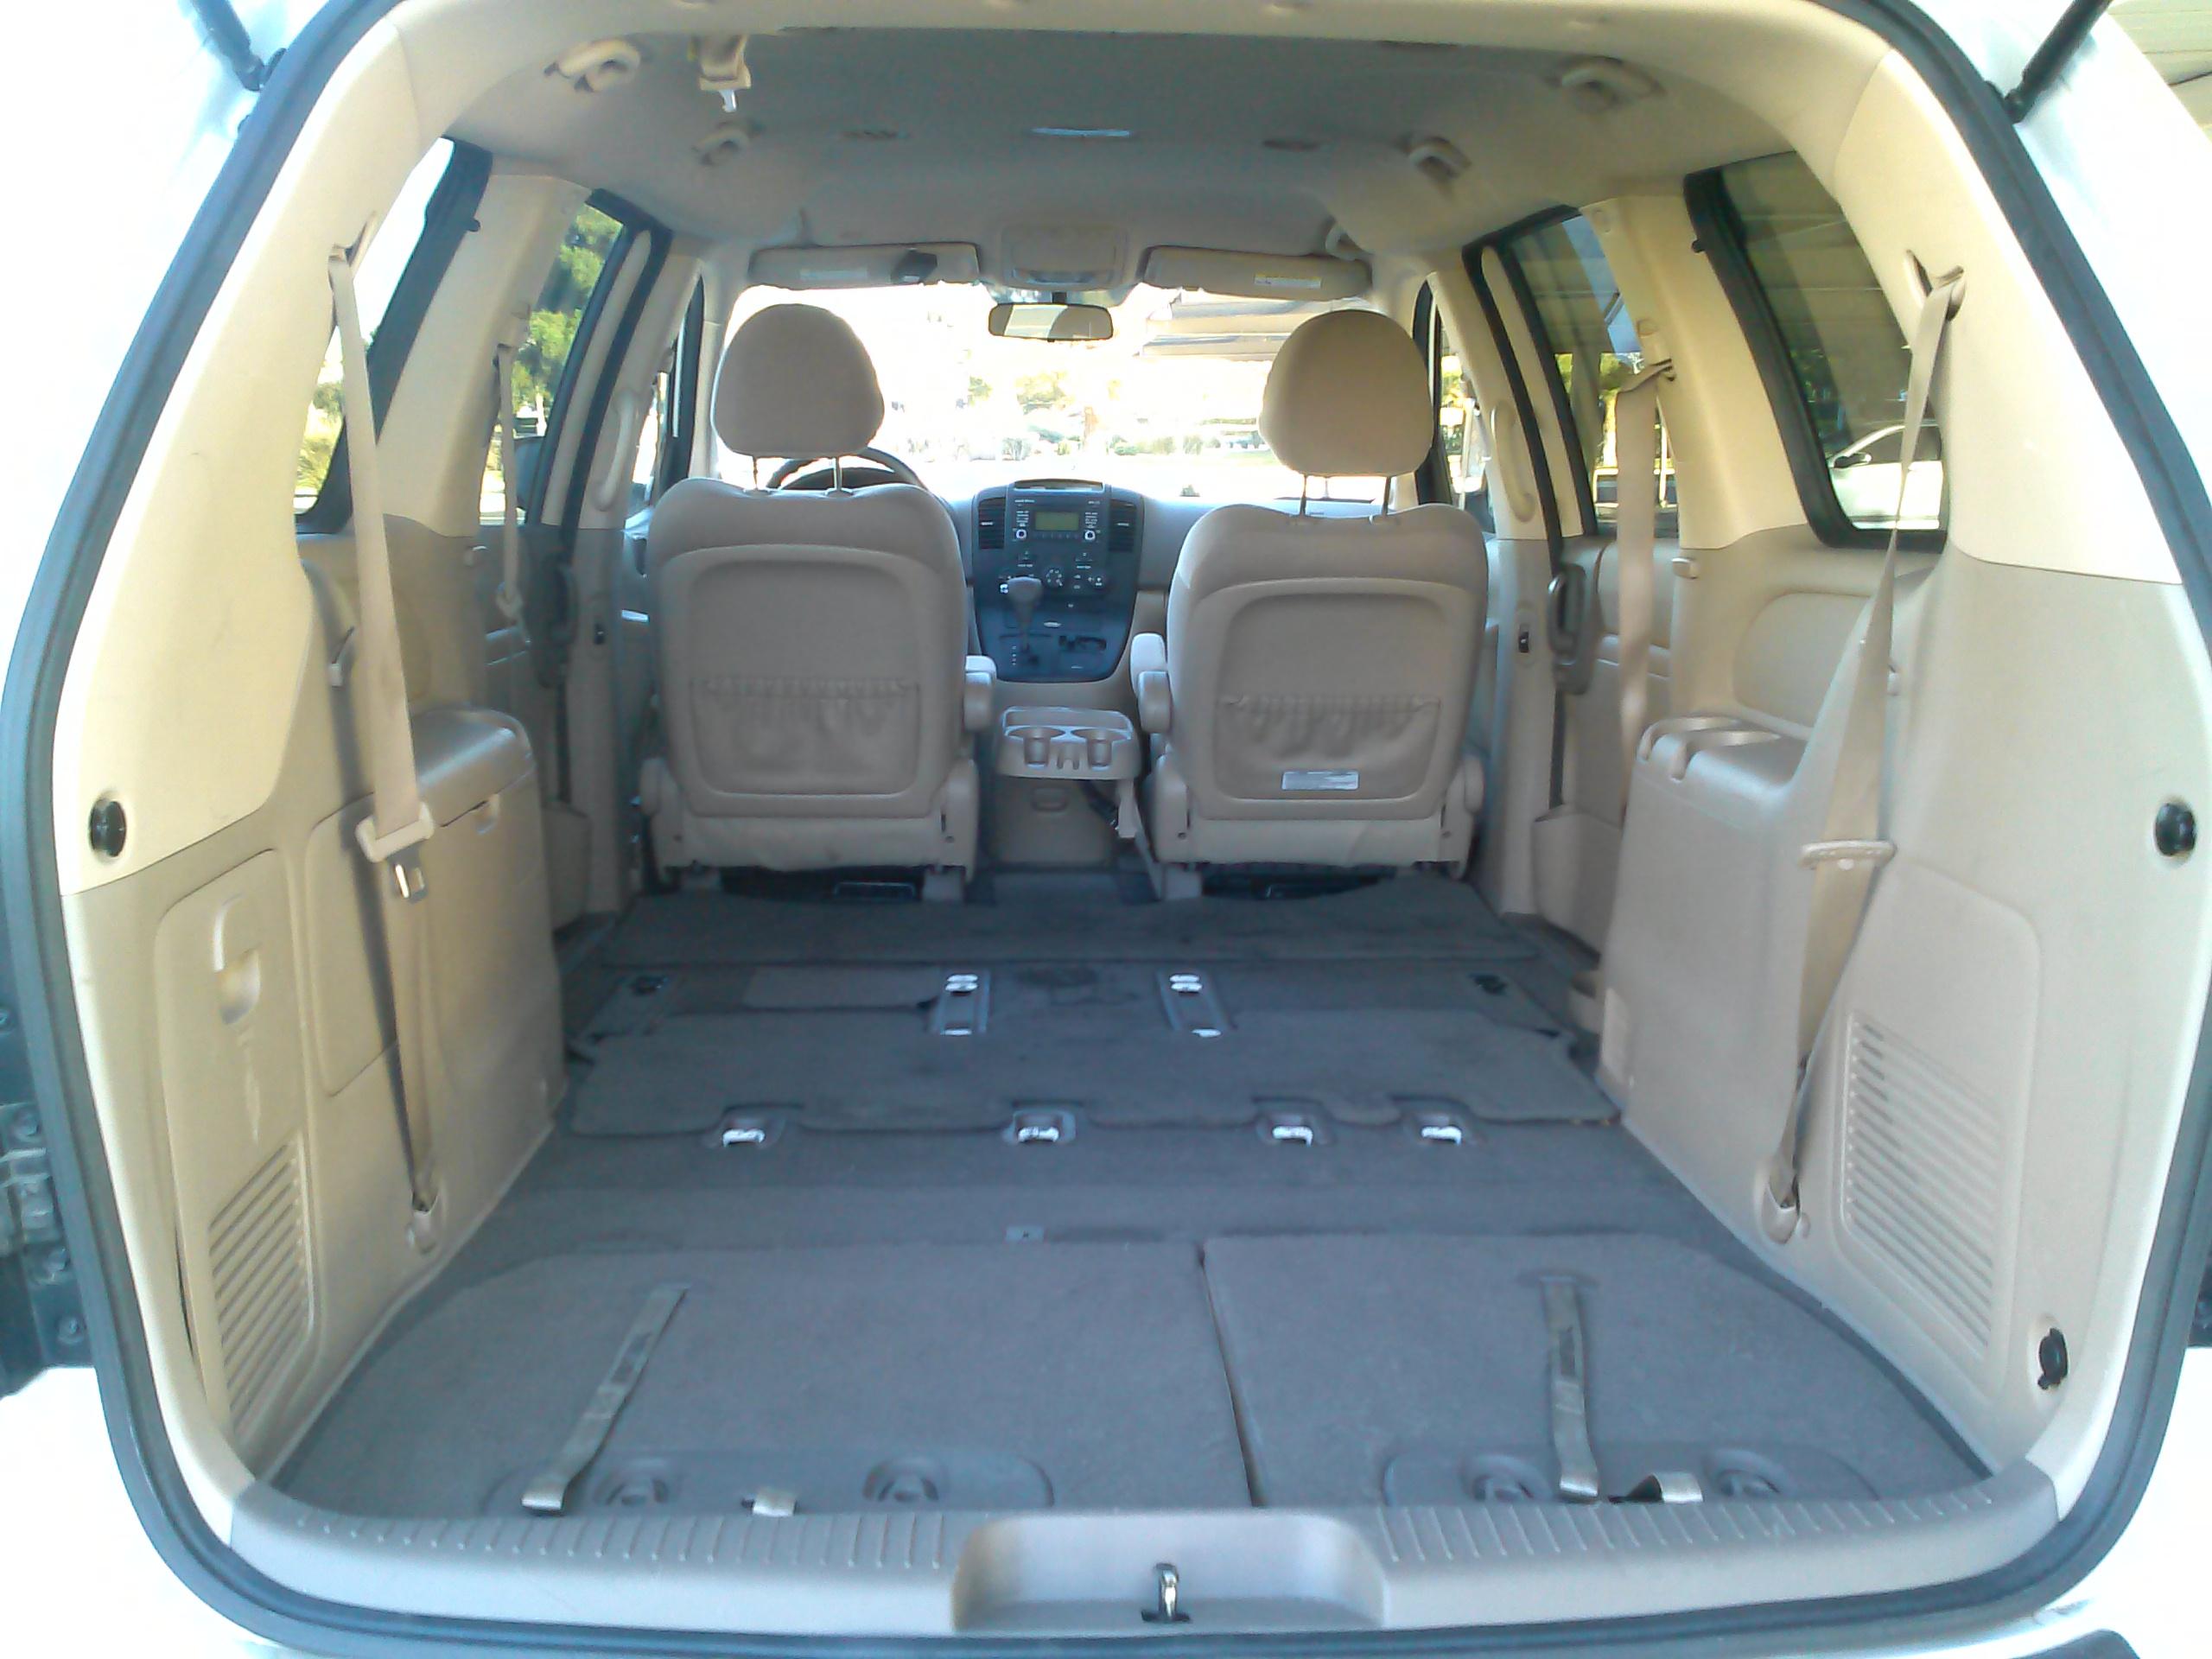 2012 Kia Sedona- Demand Some R-E-S-P-E-C-T | Reviews on ...